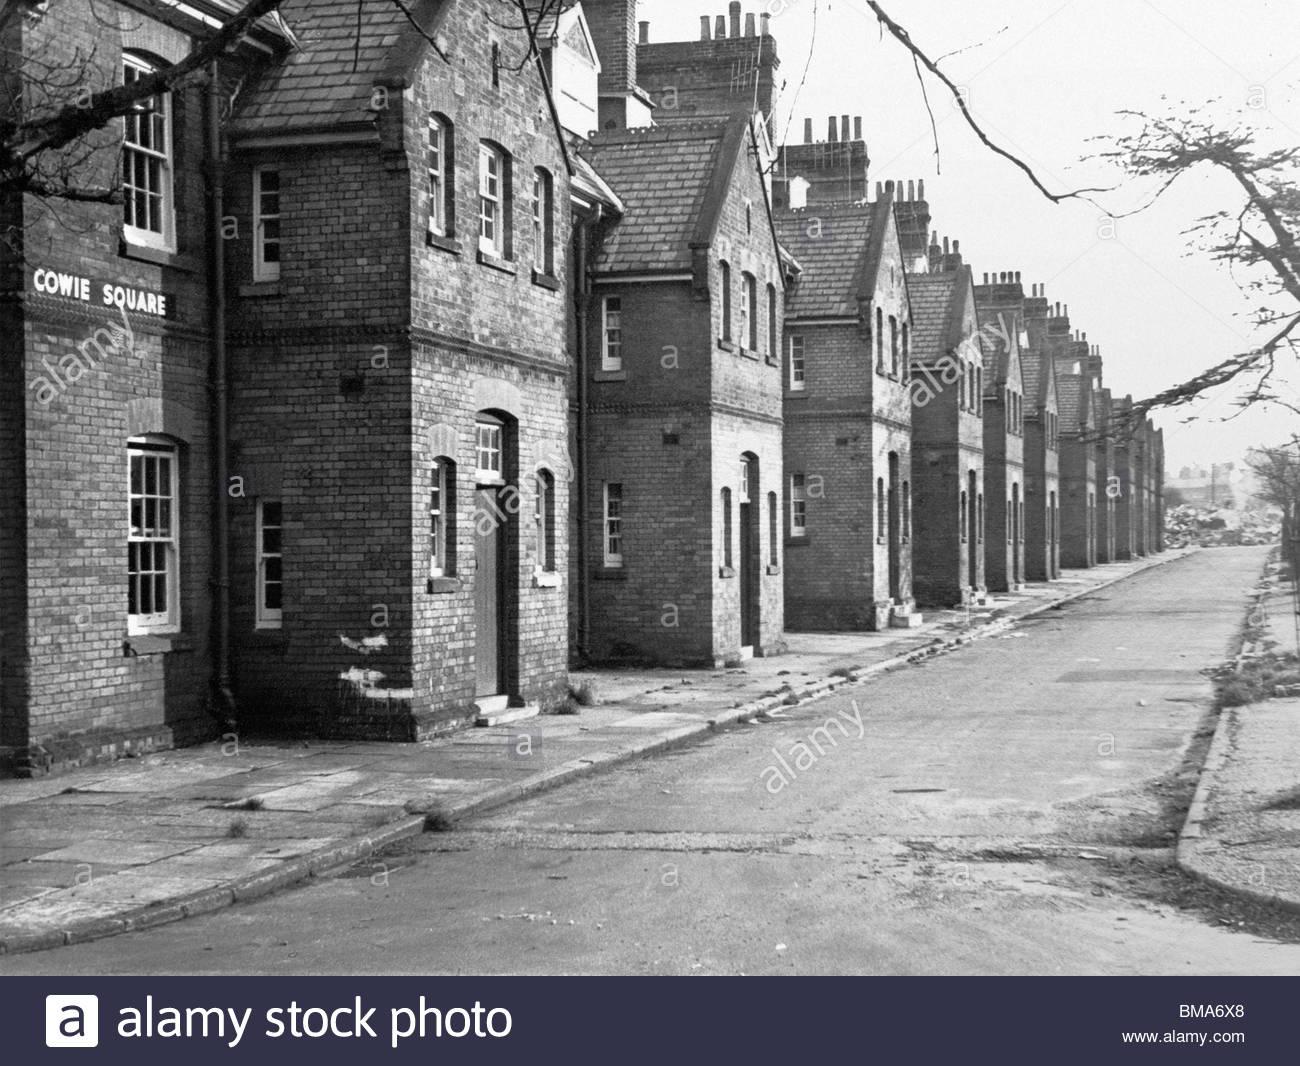 cowie square aldershot england uk victorian brick built army